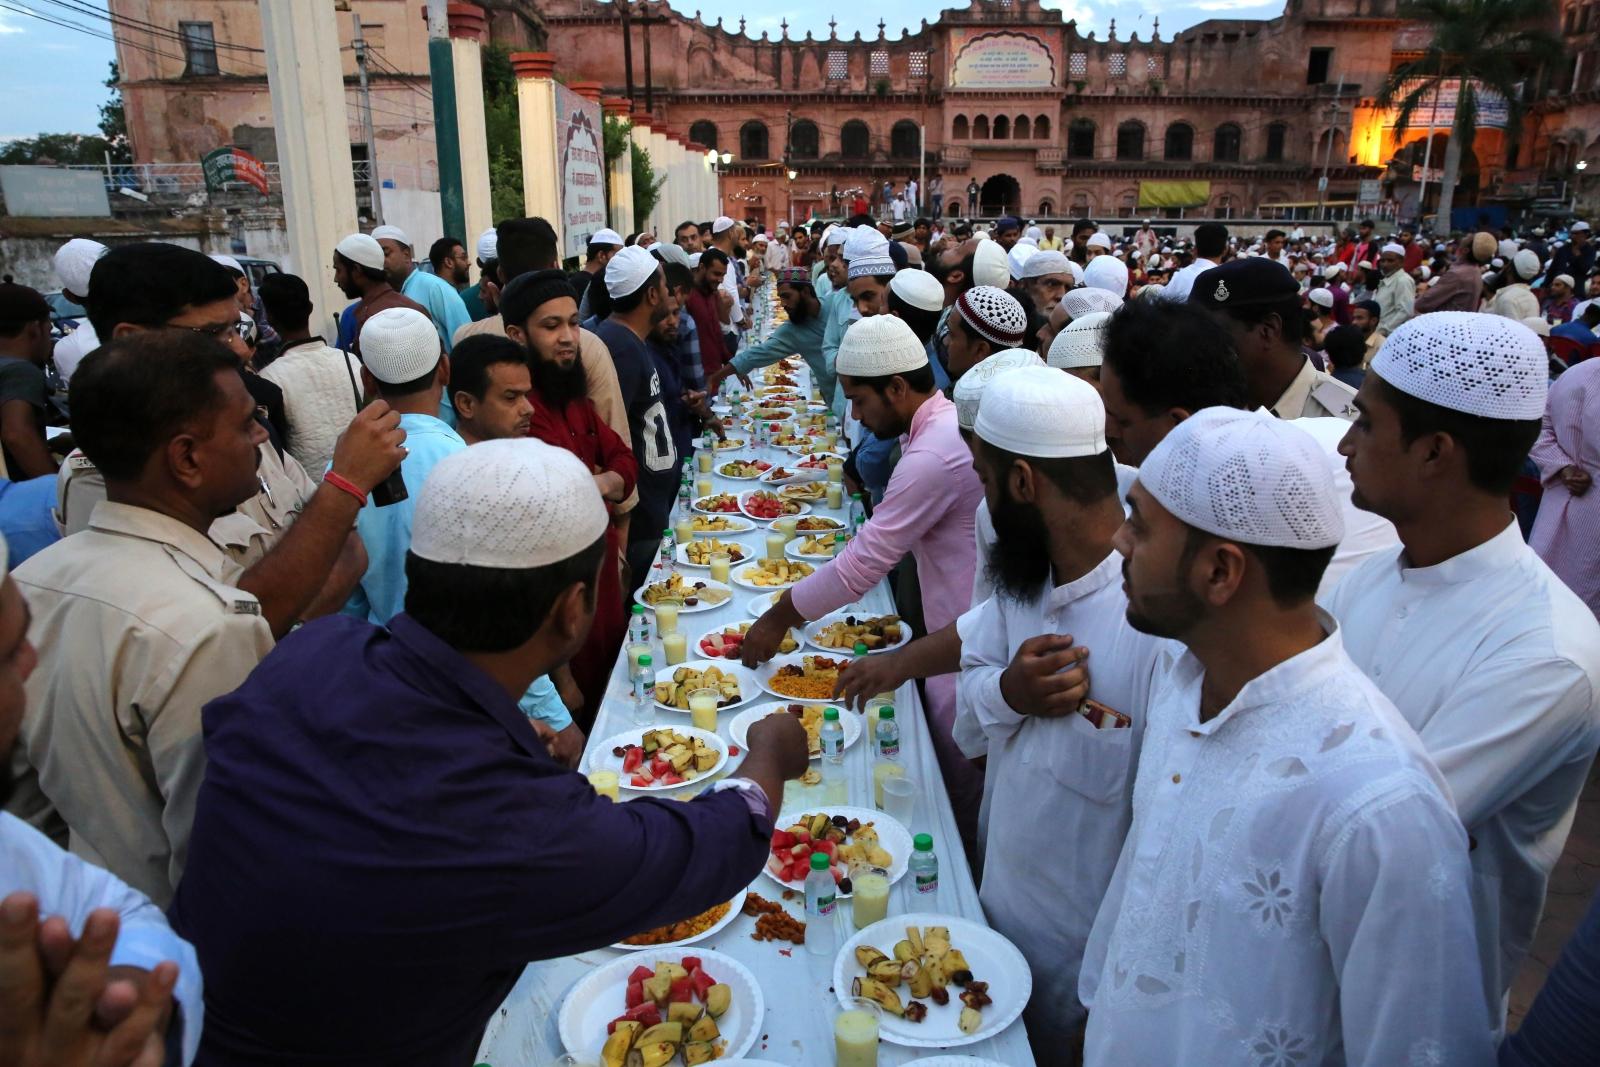 Indie, kolacja ramadanowa. fot. EPA/SANJEEV GUPTA